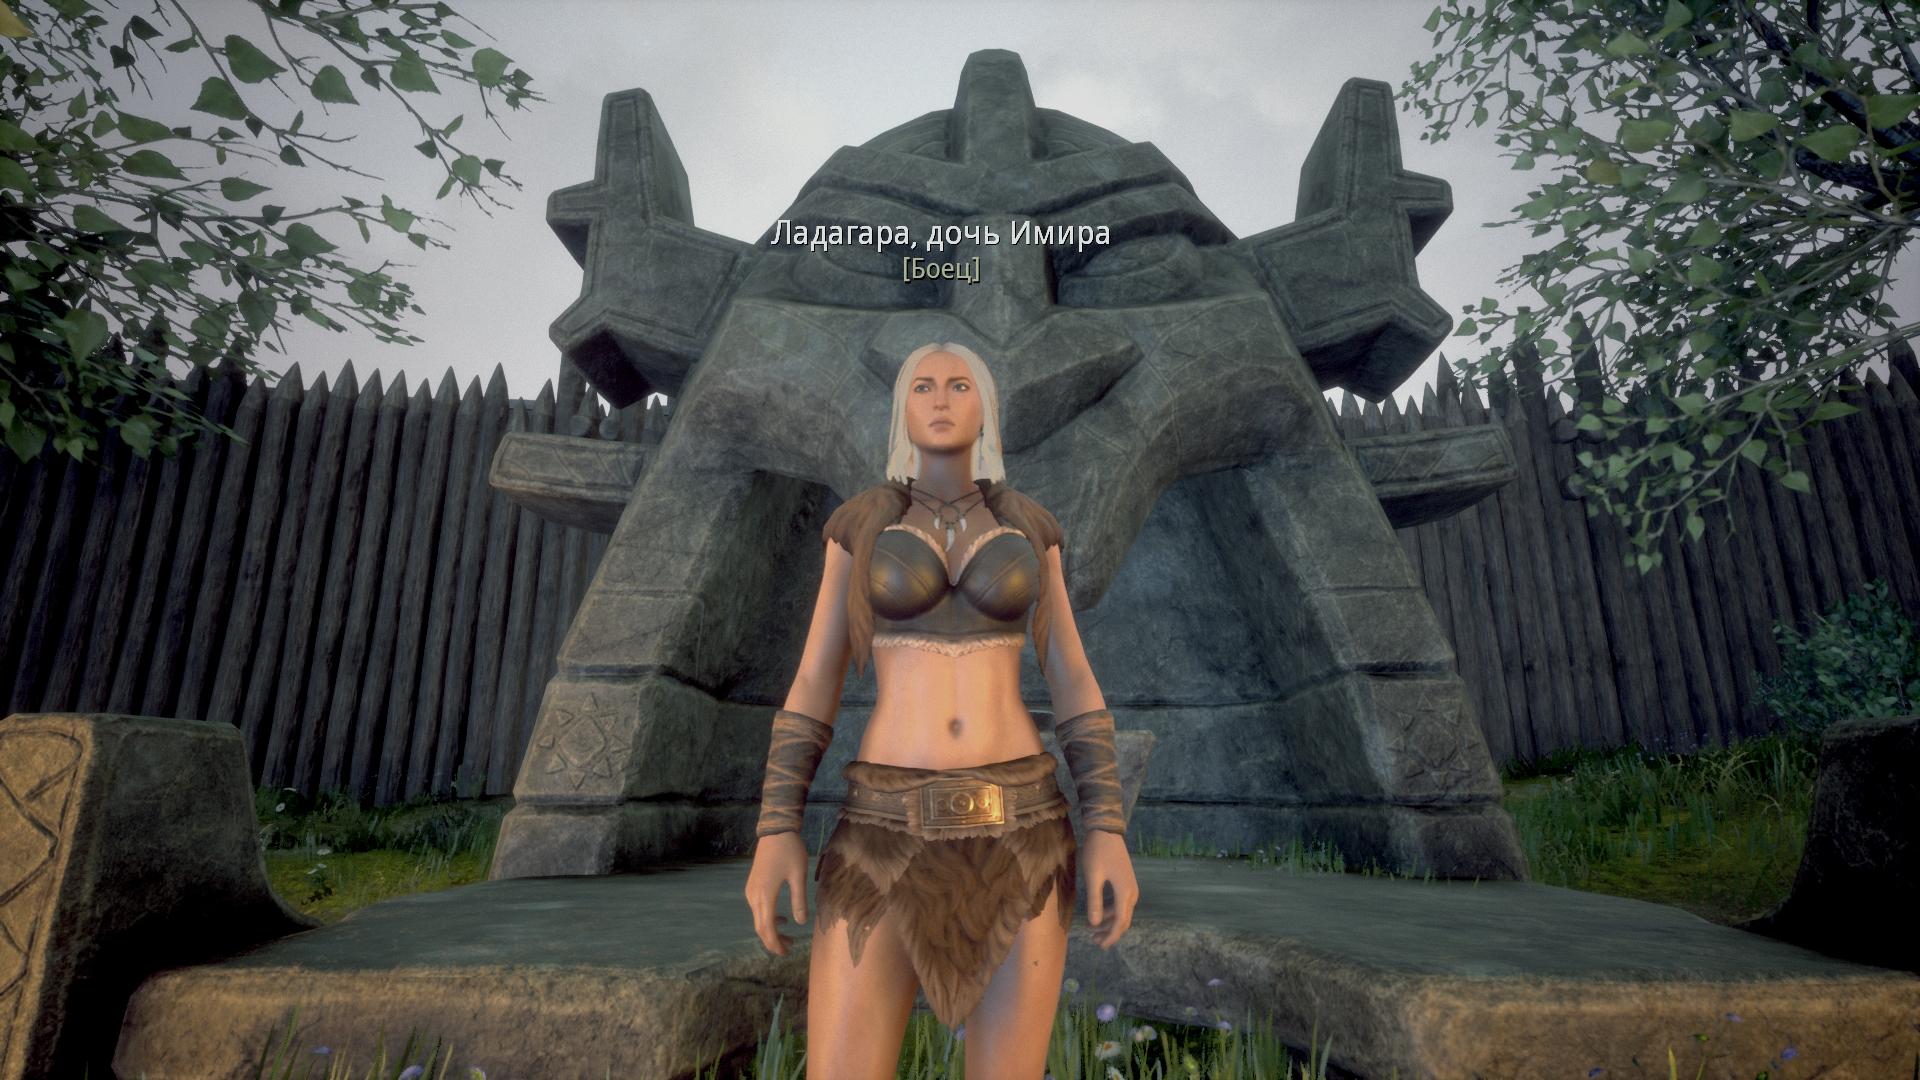 Ладагара, дочь Имира